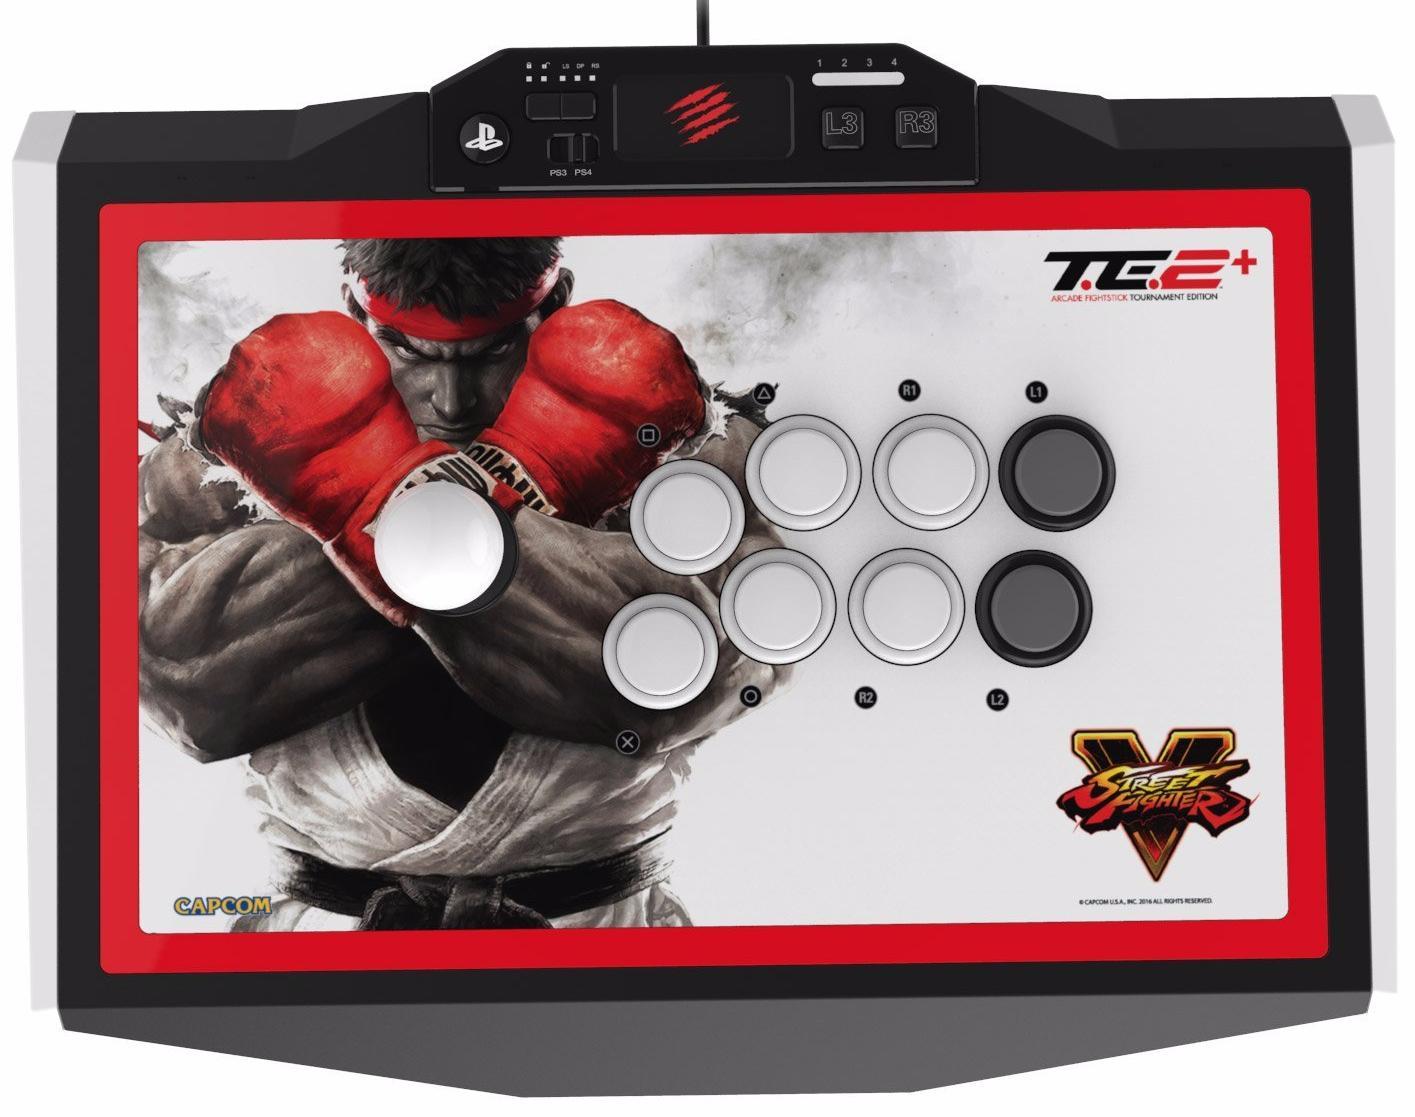 Mad Catz Arcade Fightstick Street Fighter V TE2+ SFV89481BSA1/01/1